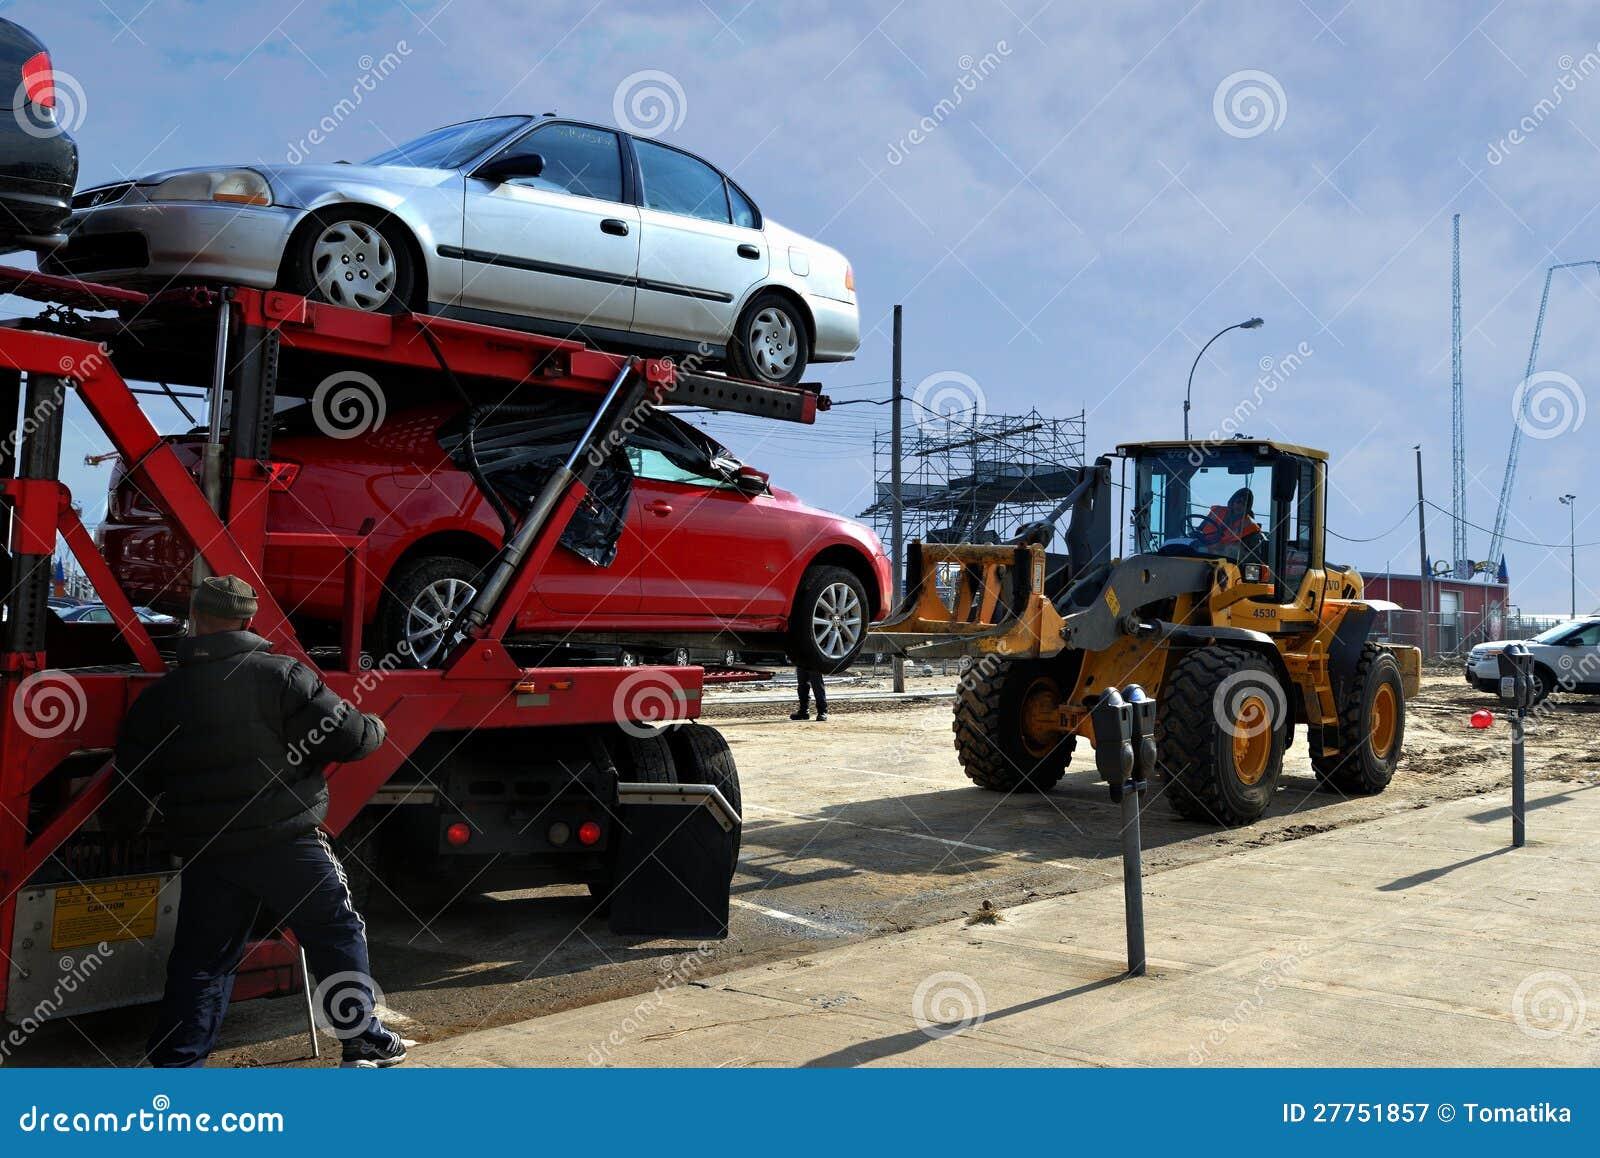 Manhattan Car Accident News